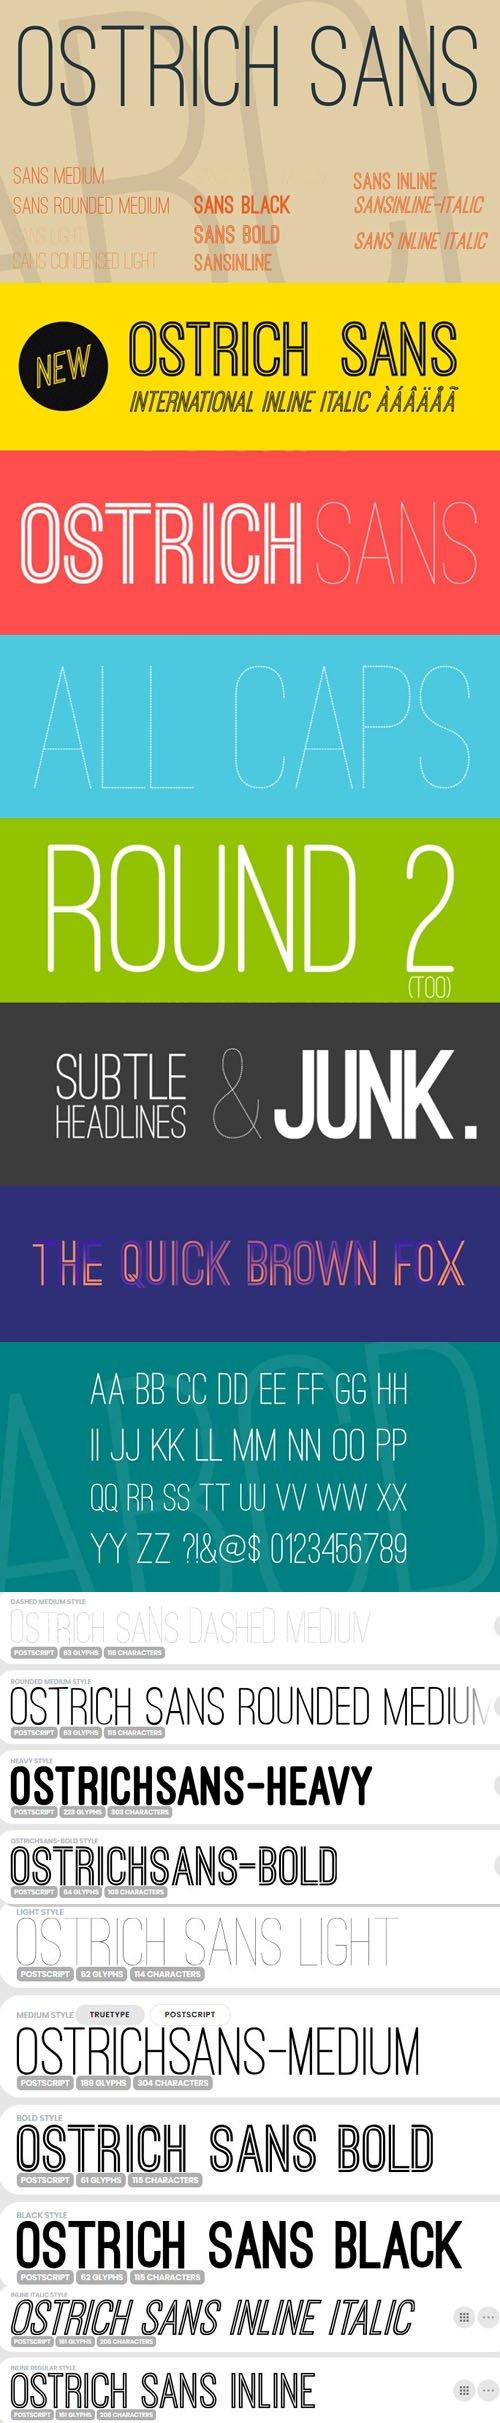 Ostrich Sans Serif Font Family [10-Weights]